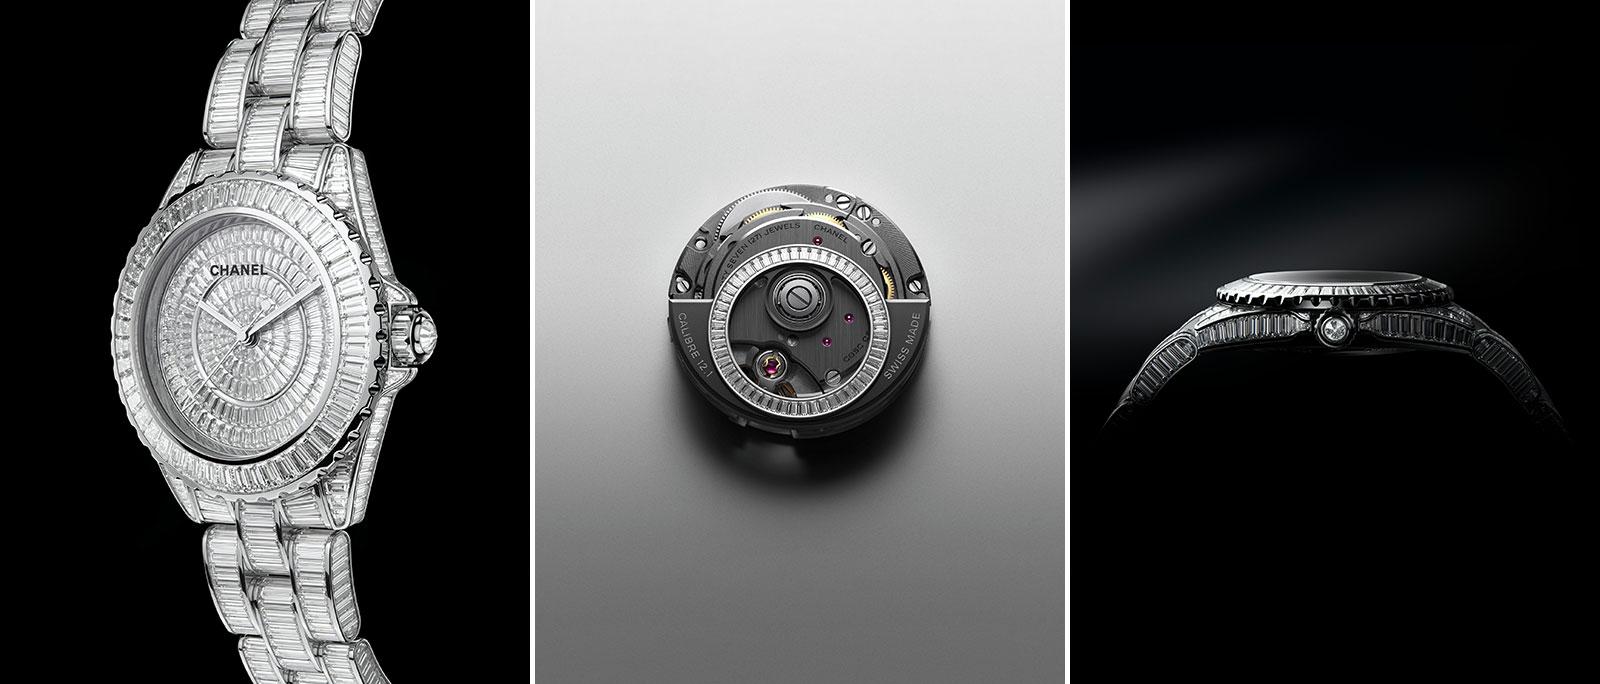 J12 Chanel